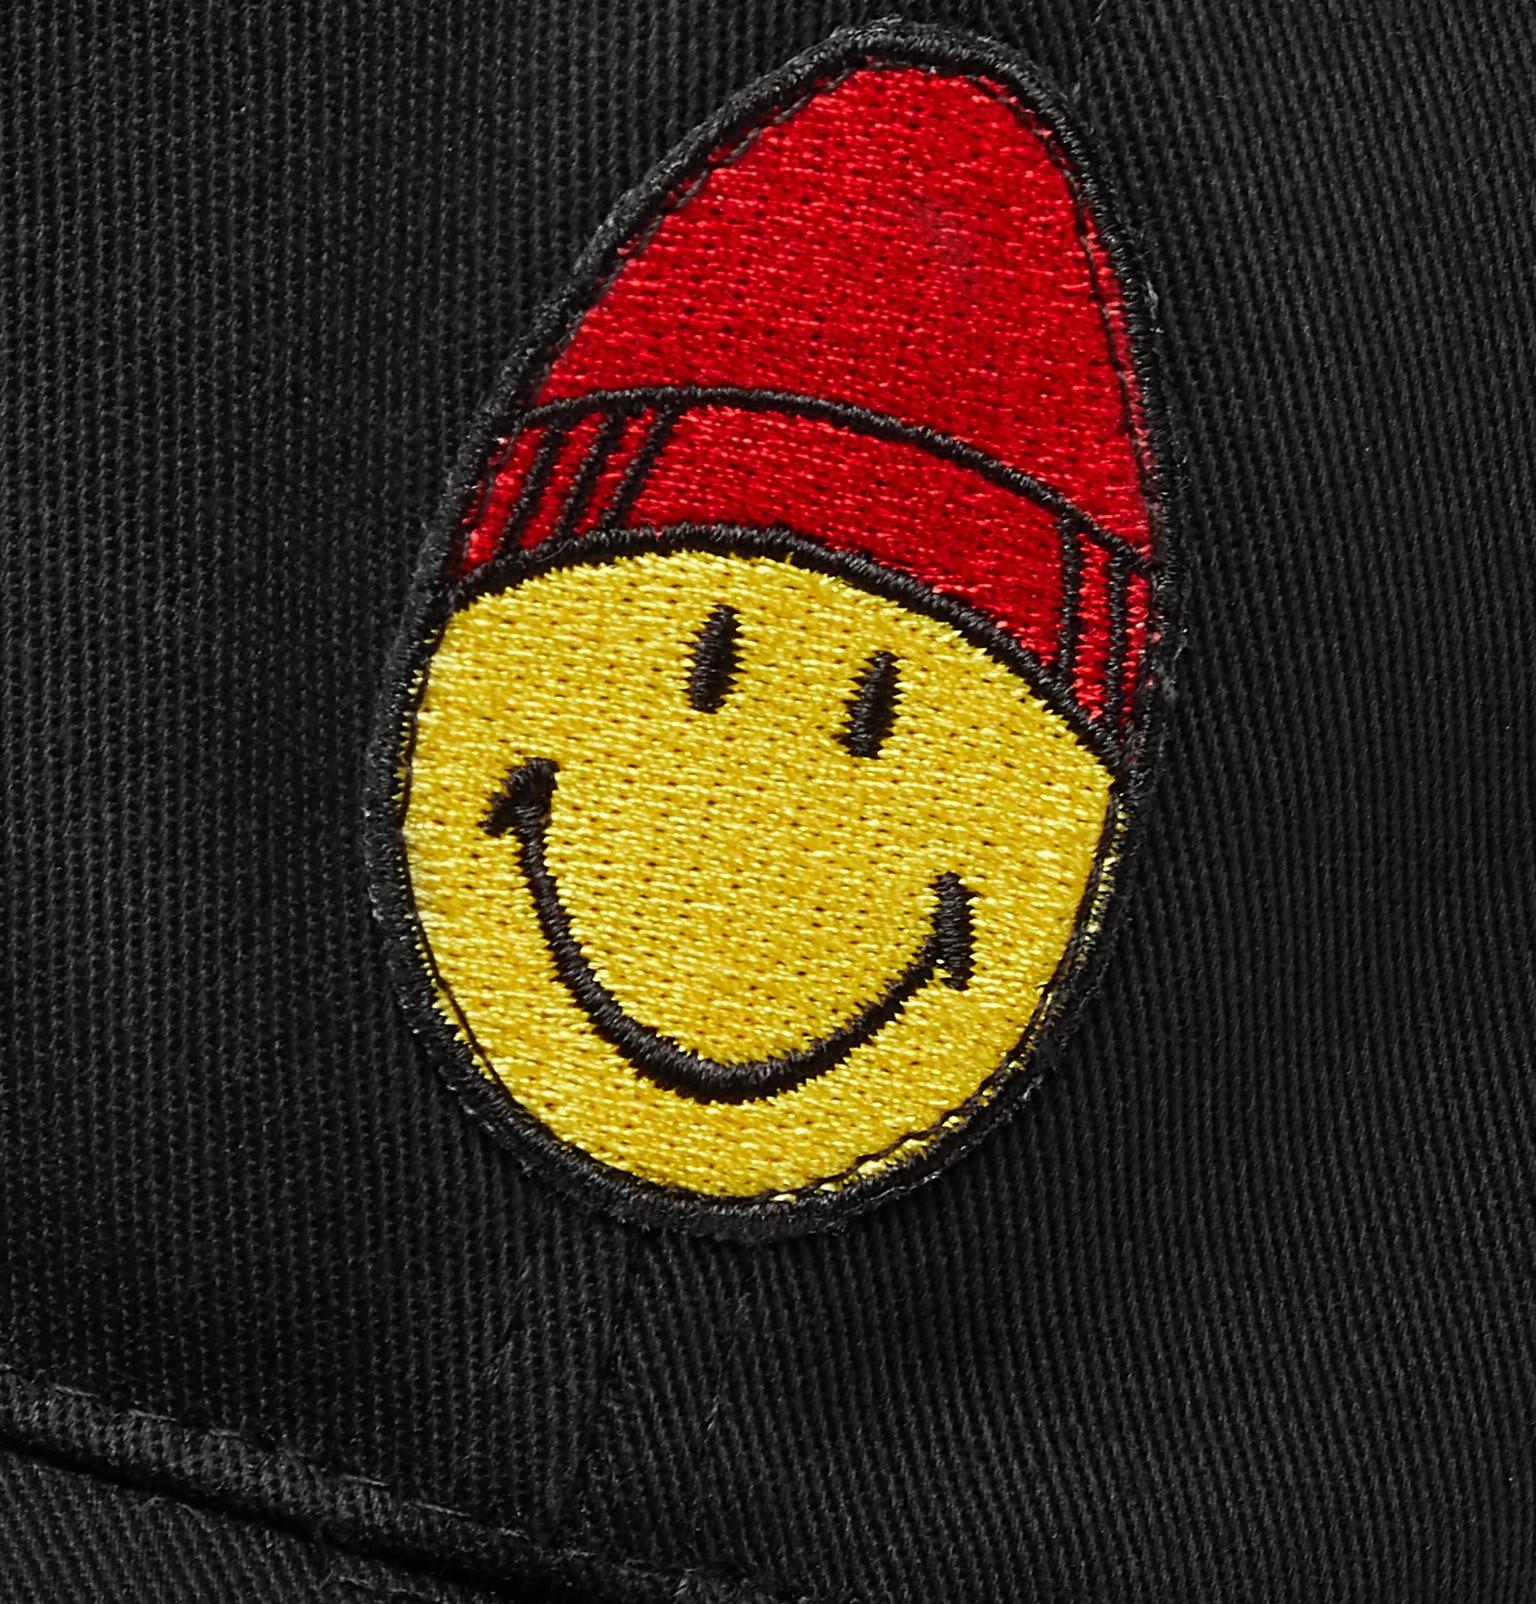 aa93582c0cf AMI - + The Smiley Company Logo-Appliquéd Cotton-Twill Baseball Cap